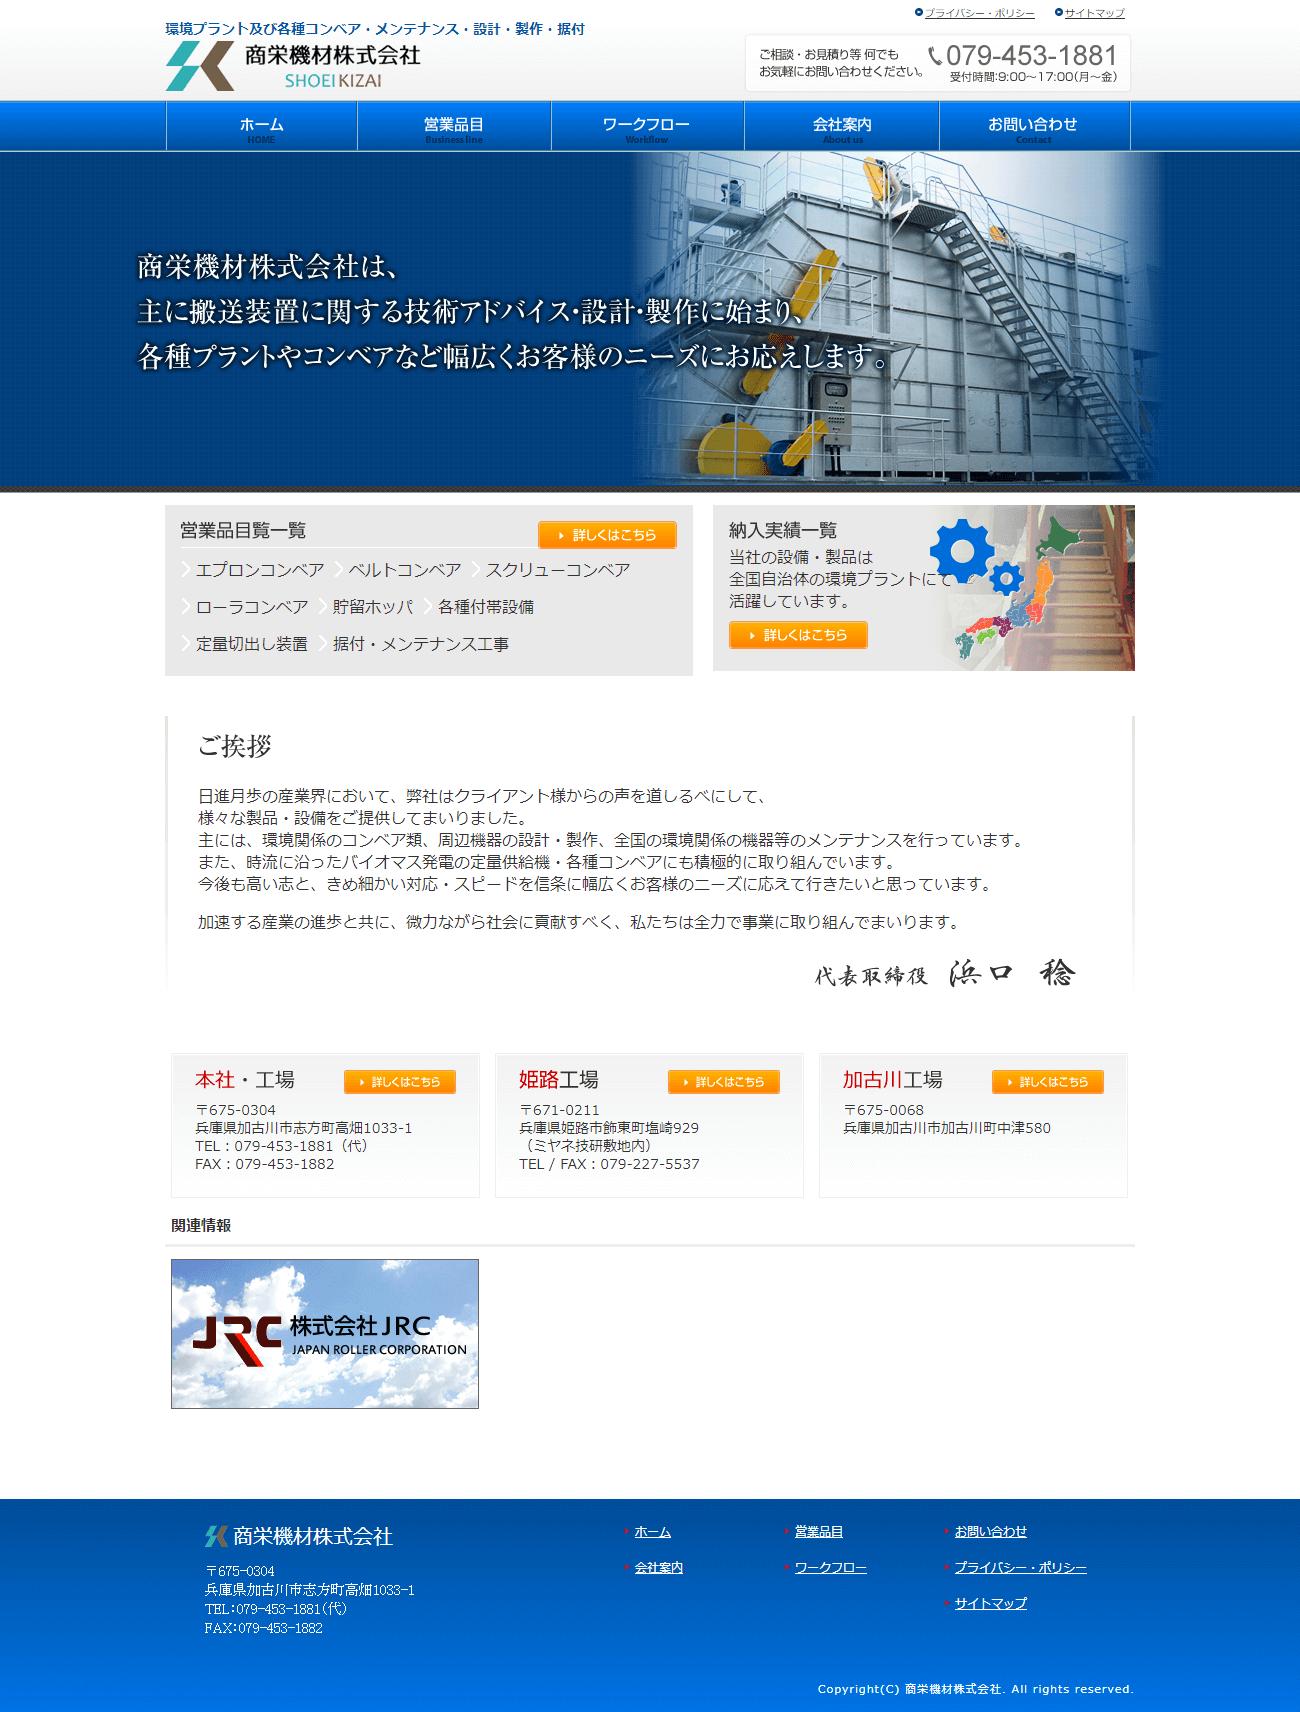 加古川市 商栄機材株式会社様 ホームページ制作1